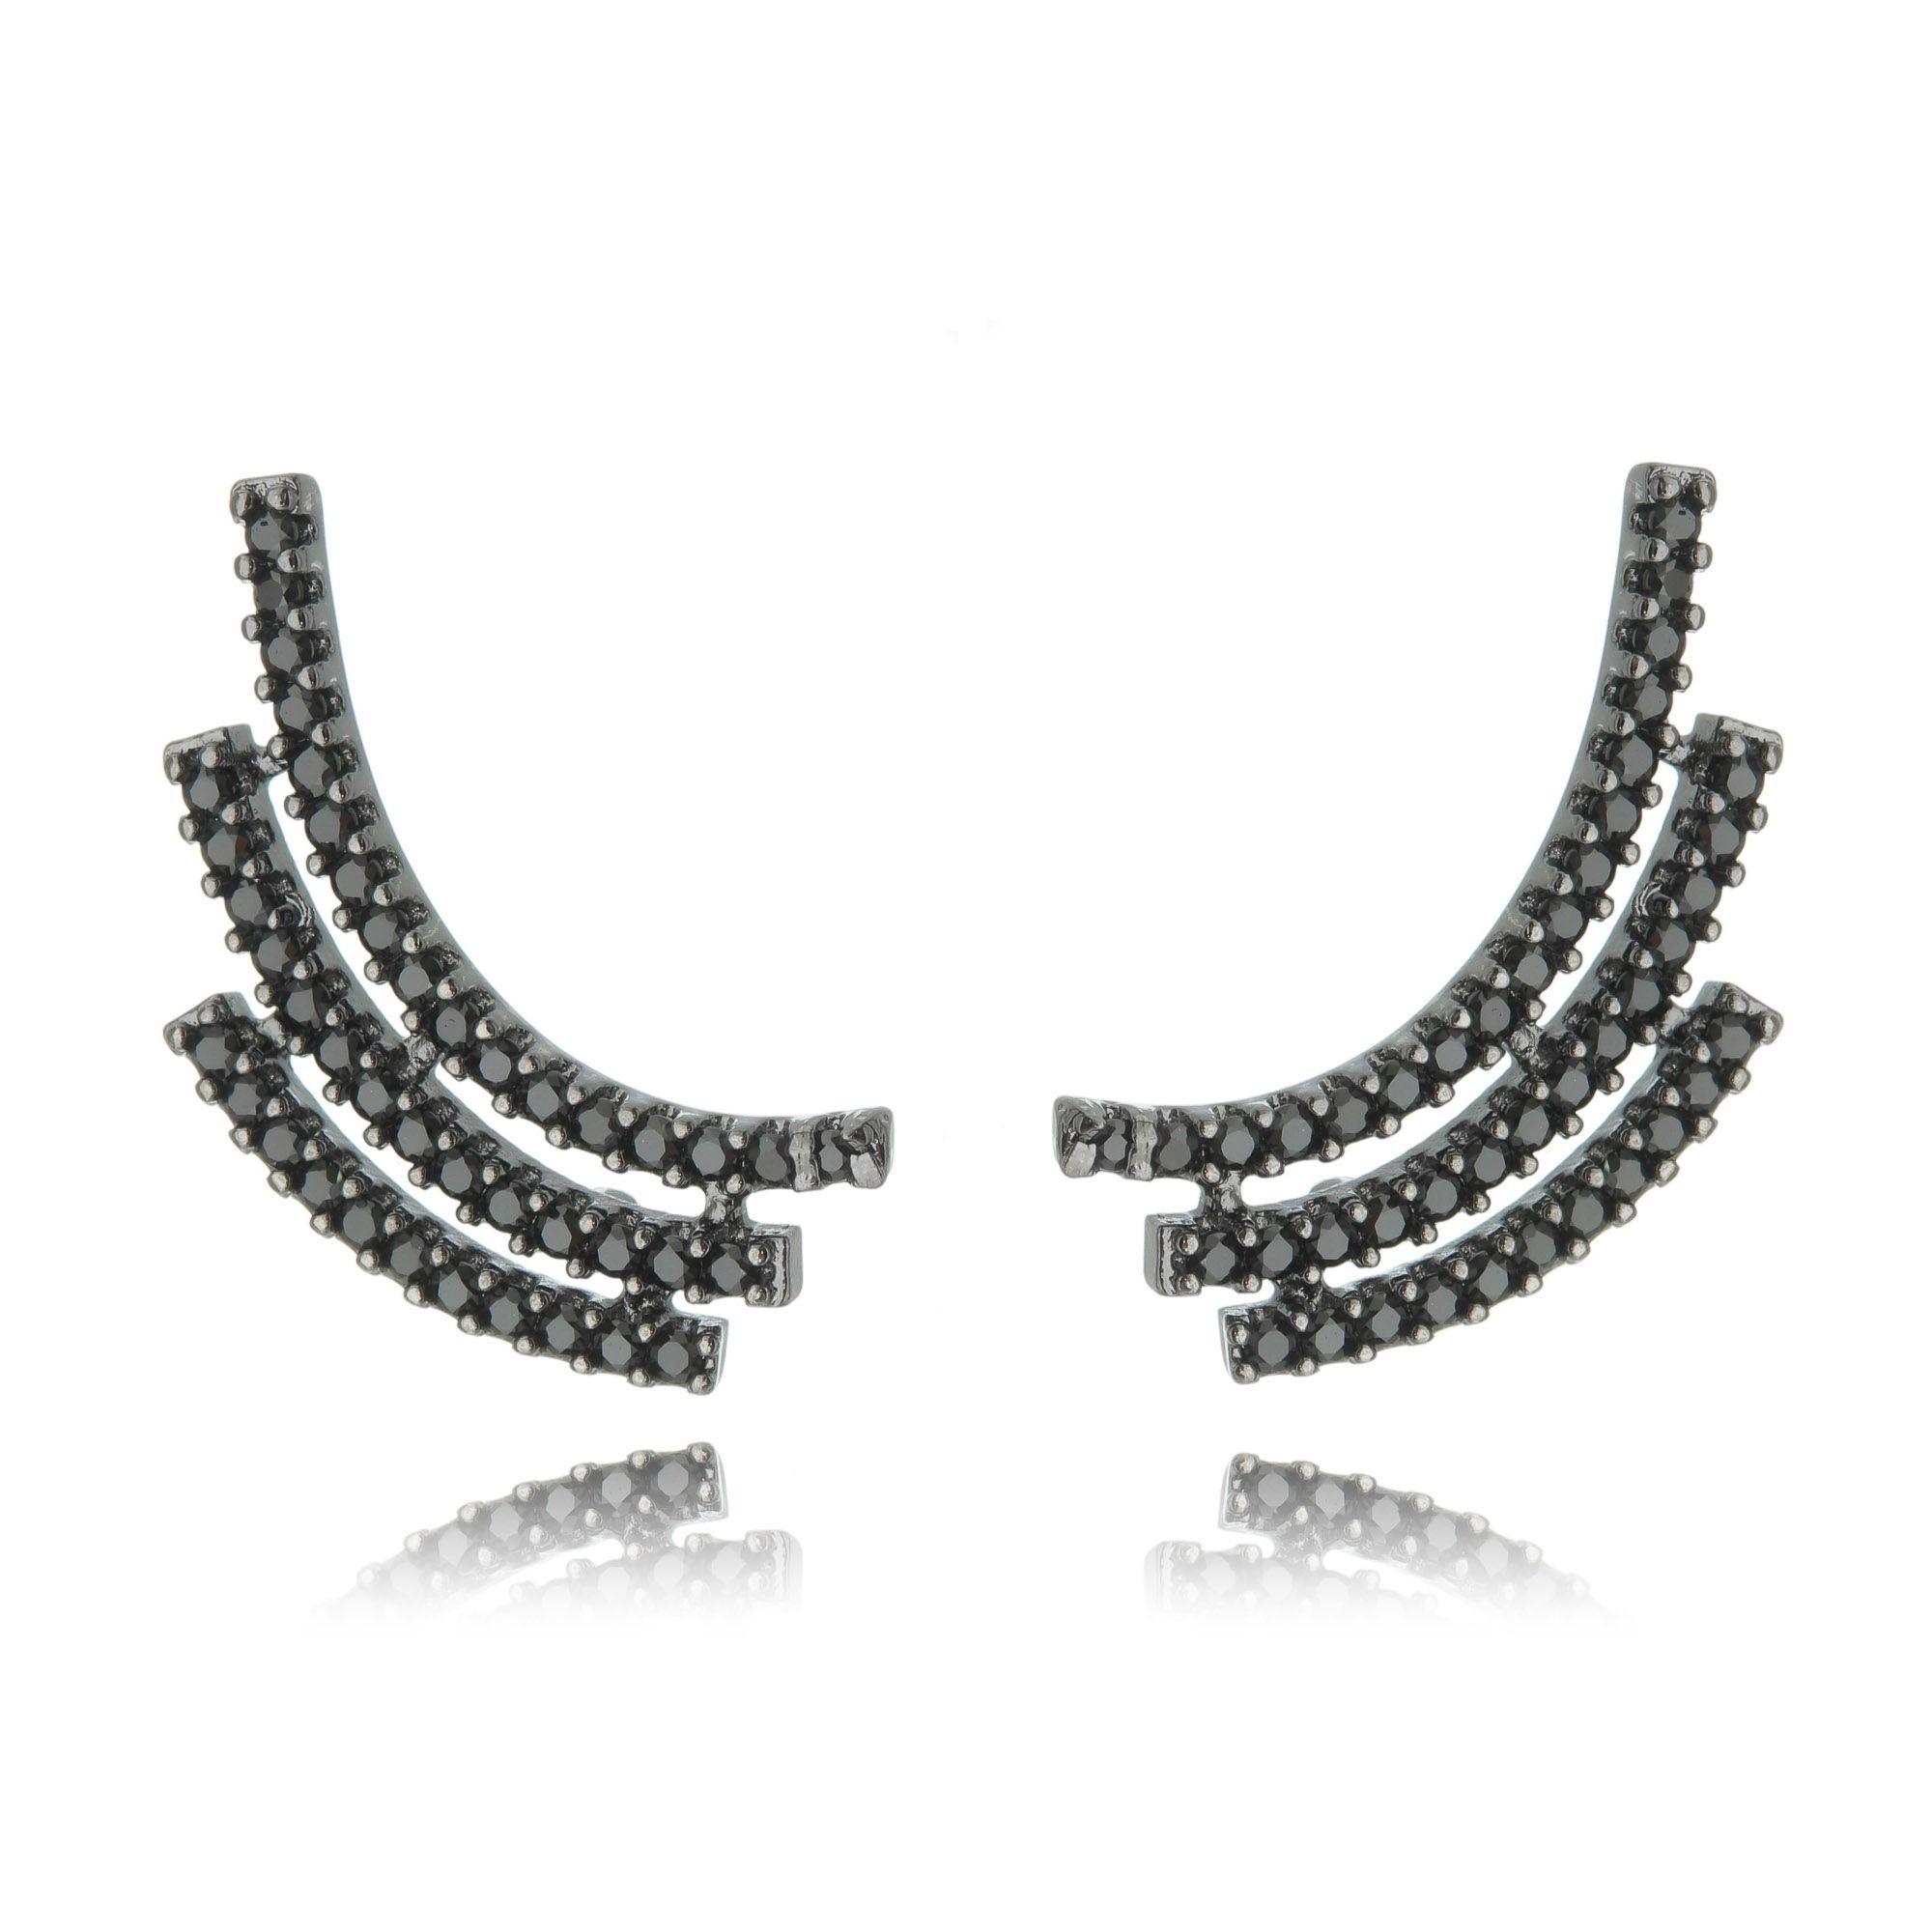 Ear Cuff Ródio Negro Zircônia Preta Semijoia de Luxo  - Soloyou